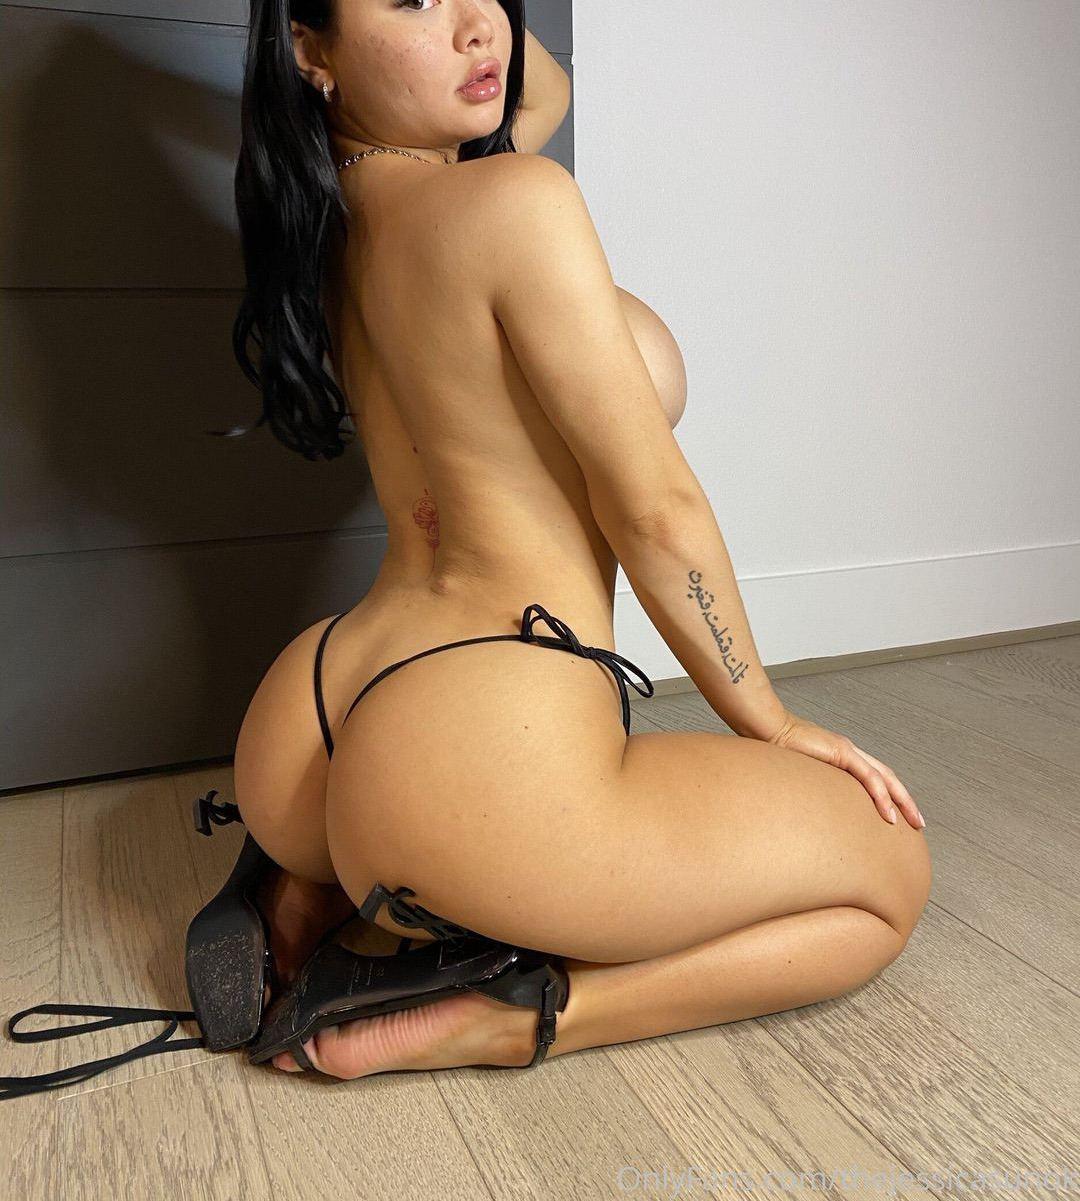 Jessica Sunok Jessicasunok Onlyfans Nudes Leaks 0001